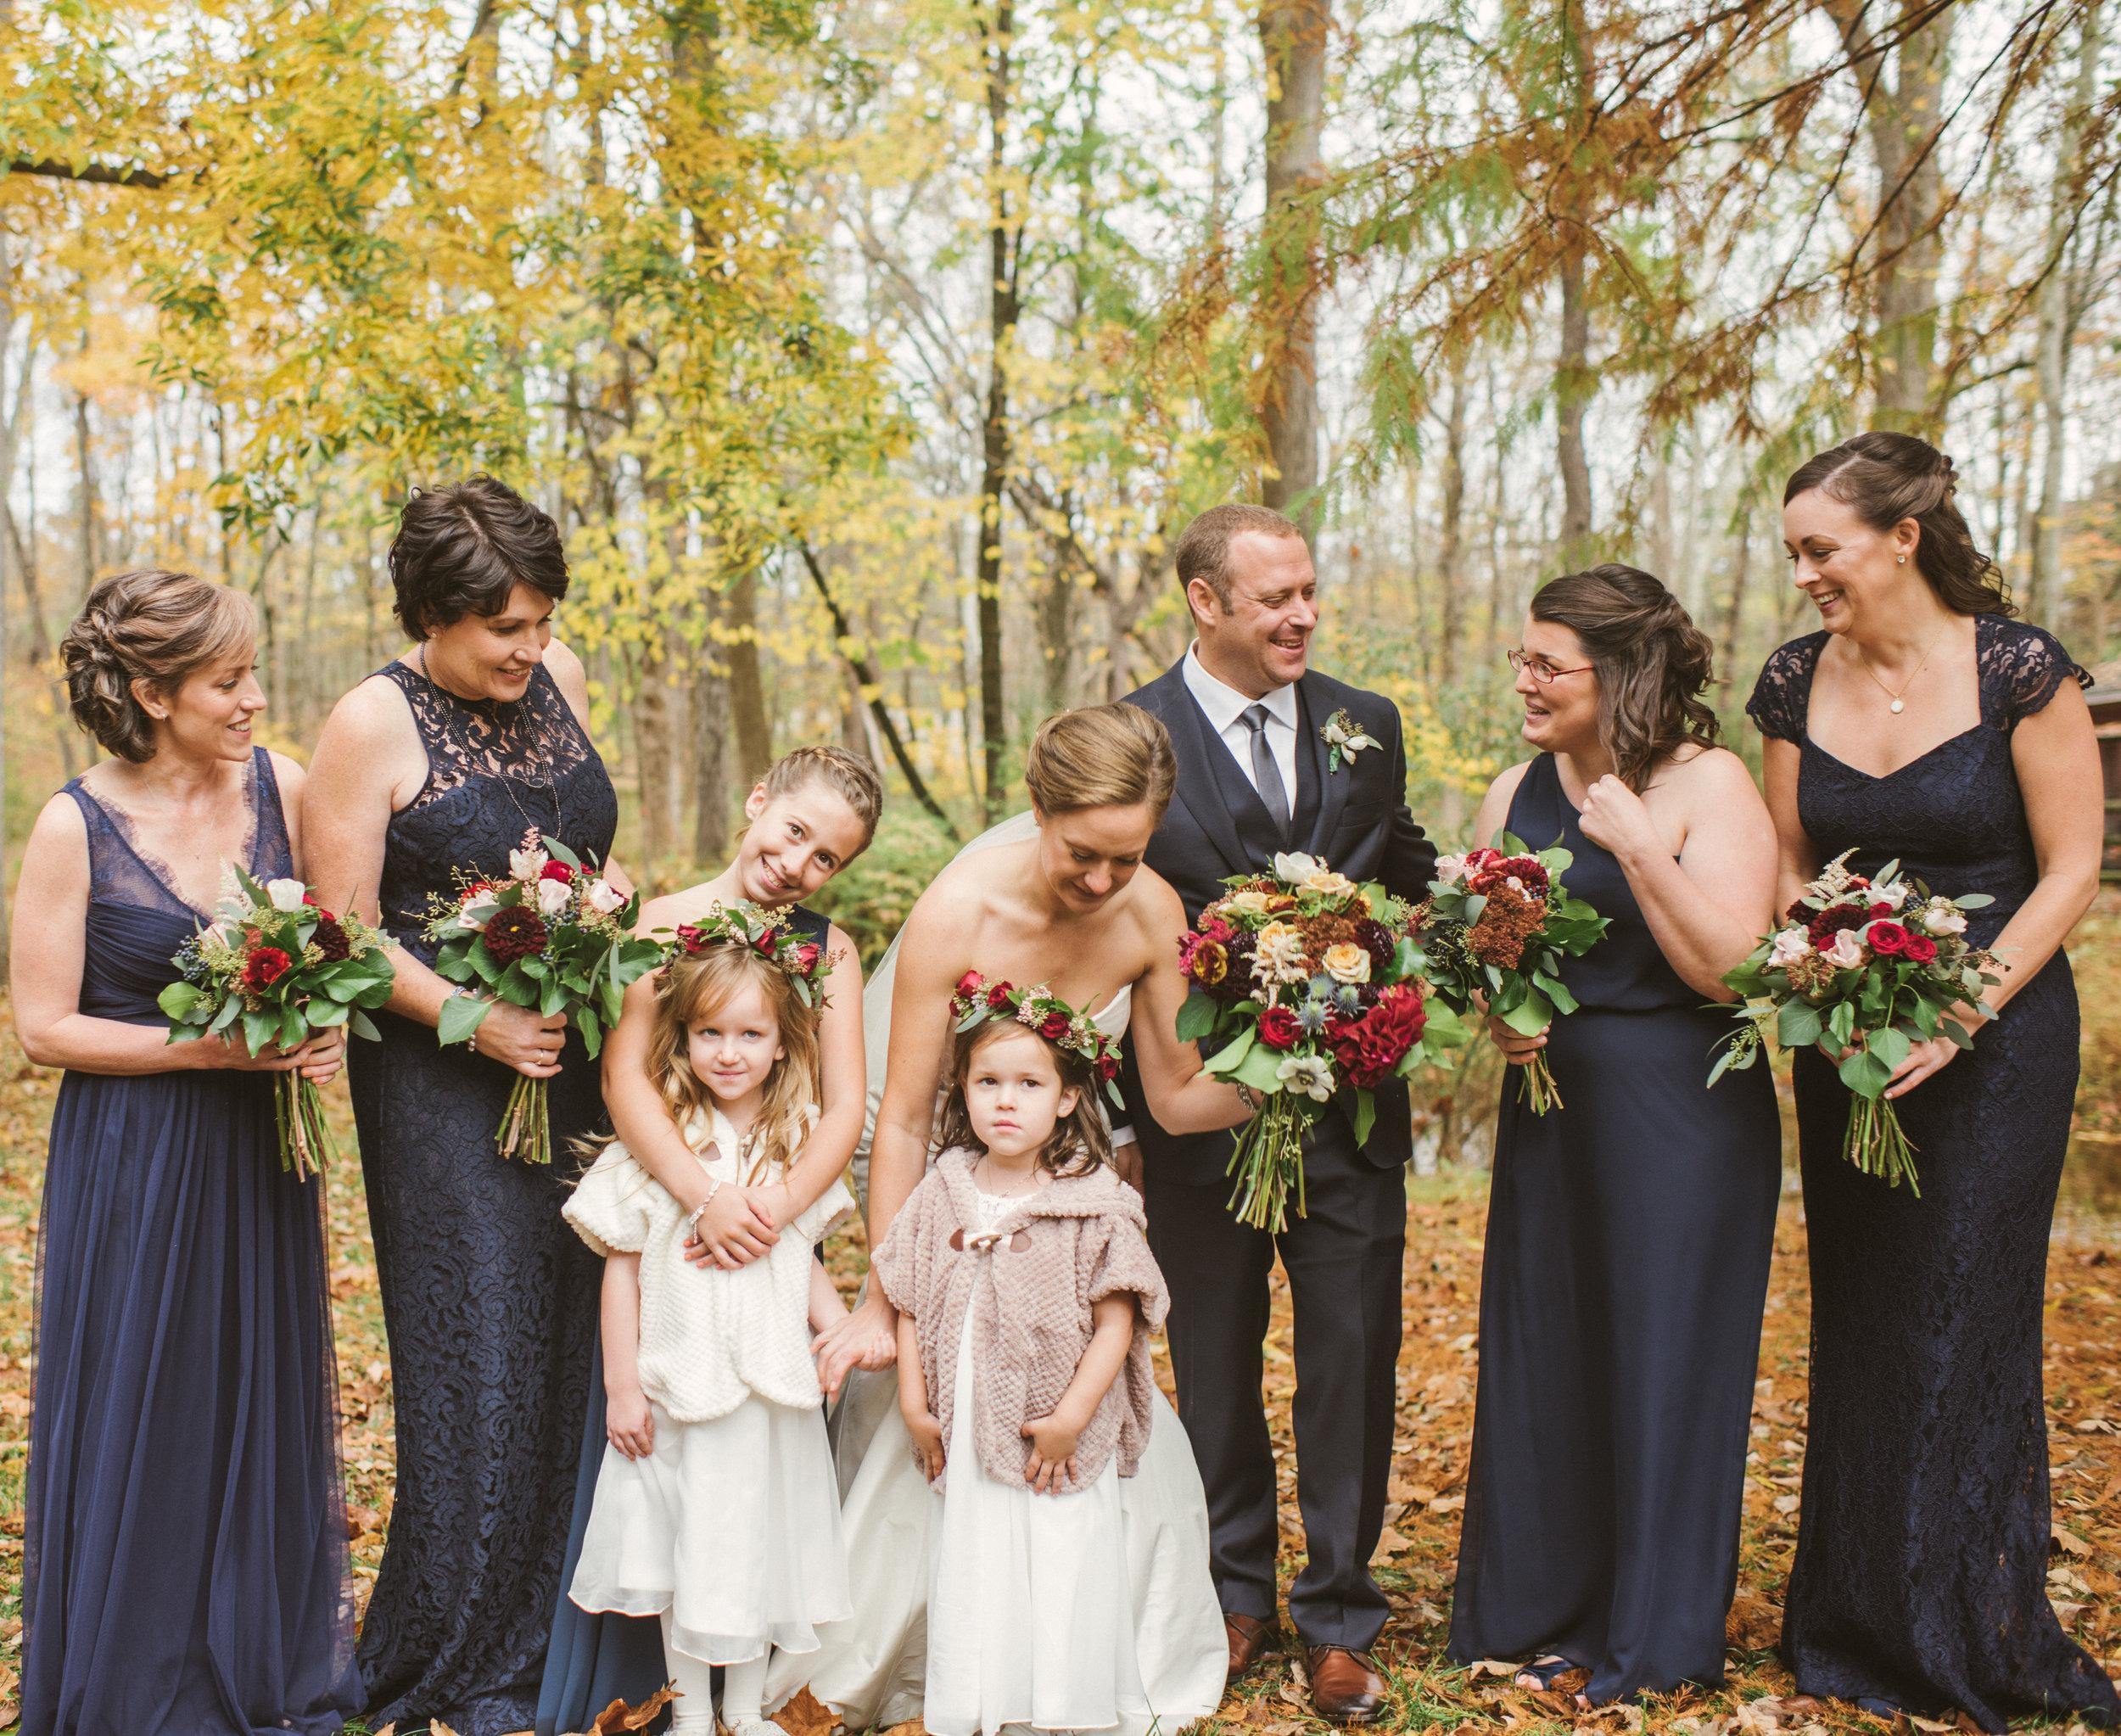 JACQUELINE & ANDREW WARSHAWER -BROOKMILL FARM FALL WEDDING - INTIMATE WEDDING PHOTOGRAPHER - TWOTWENTY by CHI-CHI AGBIM-338.jpg